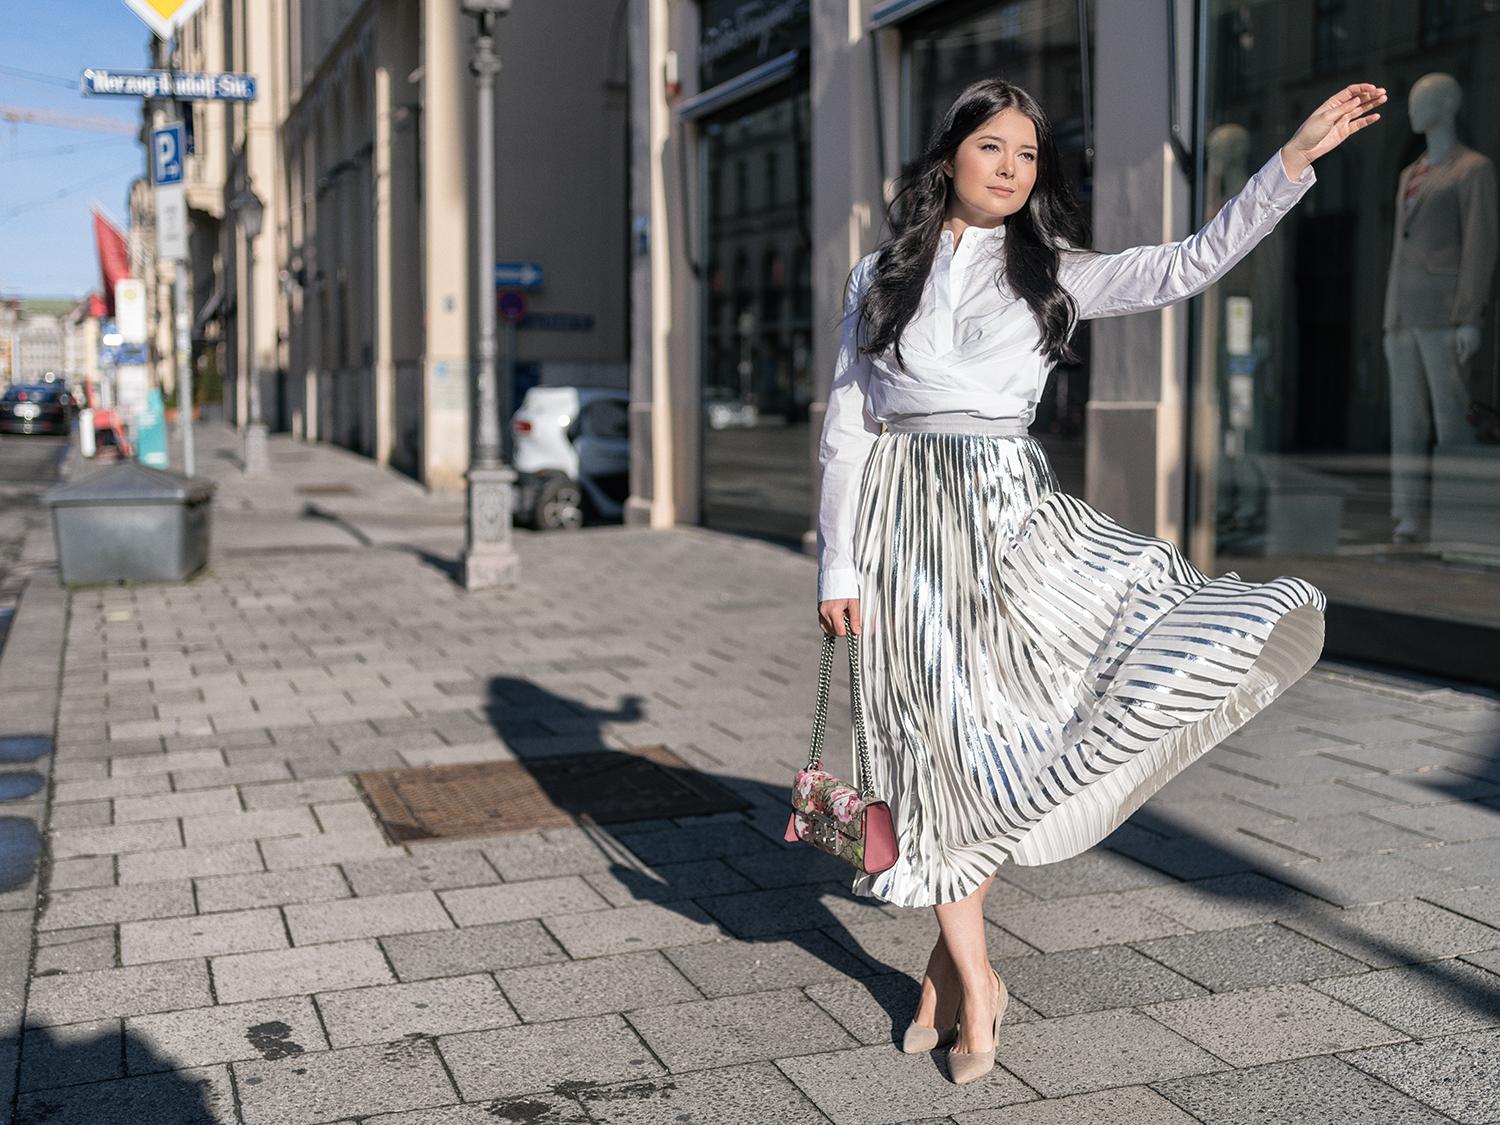 fashionambit-fashionblog-muenchen-styleblog-munich-blogger-deutschland-fashionblogger-bloggerdeutschland-style-blog-lifestyle-blog-modeblog-metallic-outfit-trend-